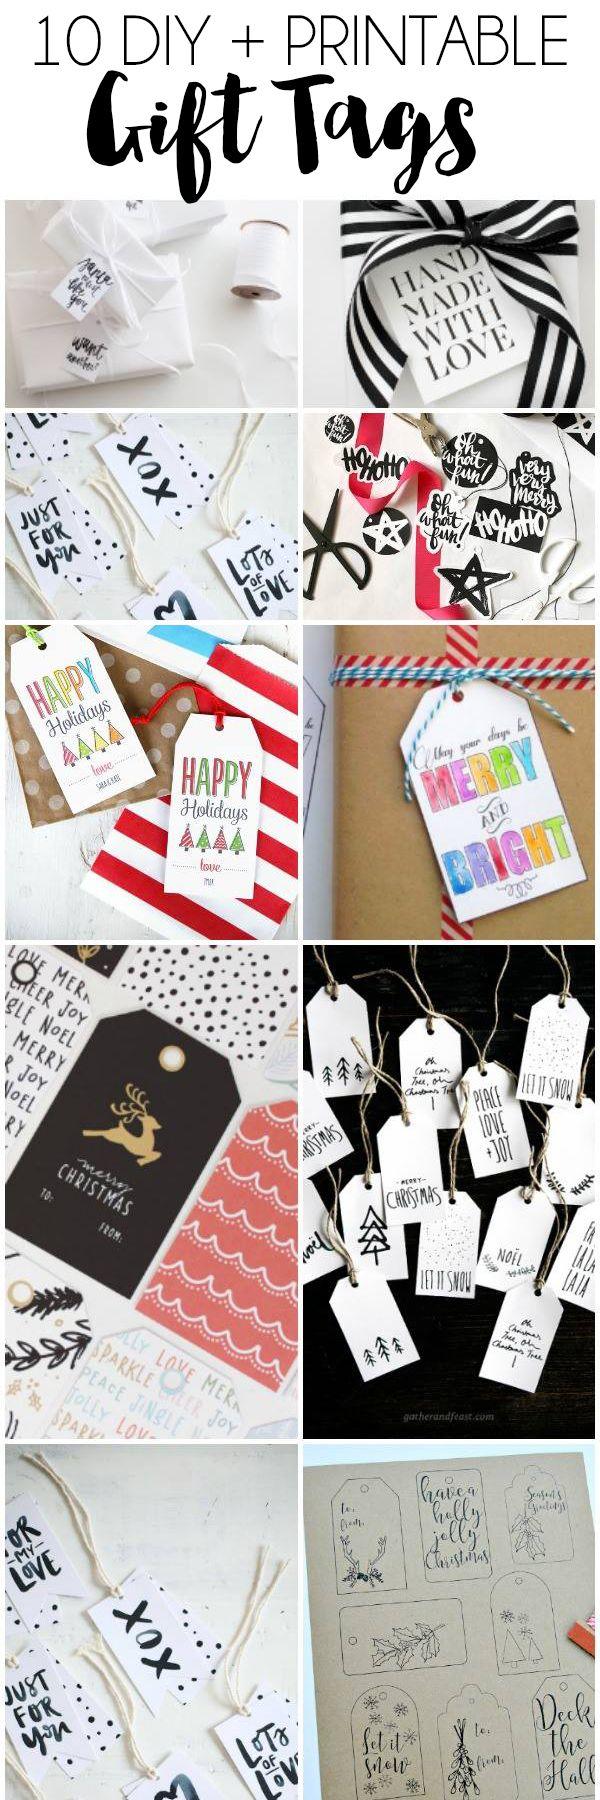 10 DIY + Printable Gift Tags   dawnnicoledesigns.com